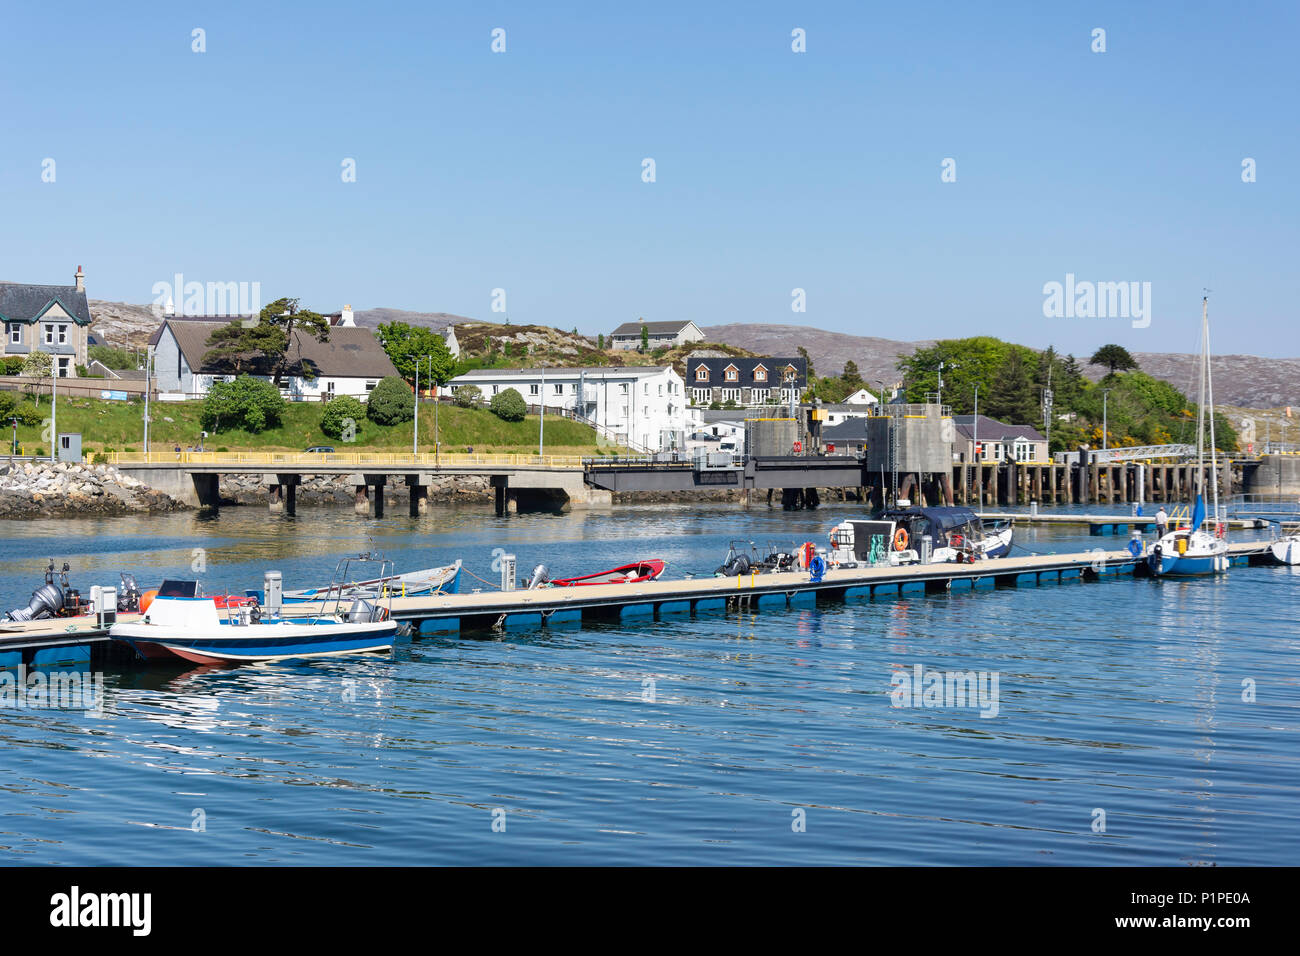 Tarbert (Tairbeart), Isle of Harris, Outer Hebrides, Na h-Eileanan Siar, Scotland, United Kingdom - Stock Image